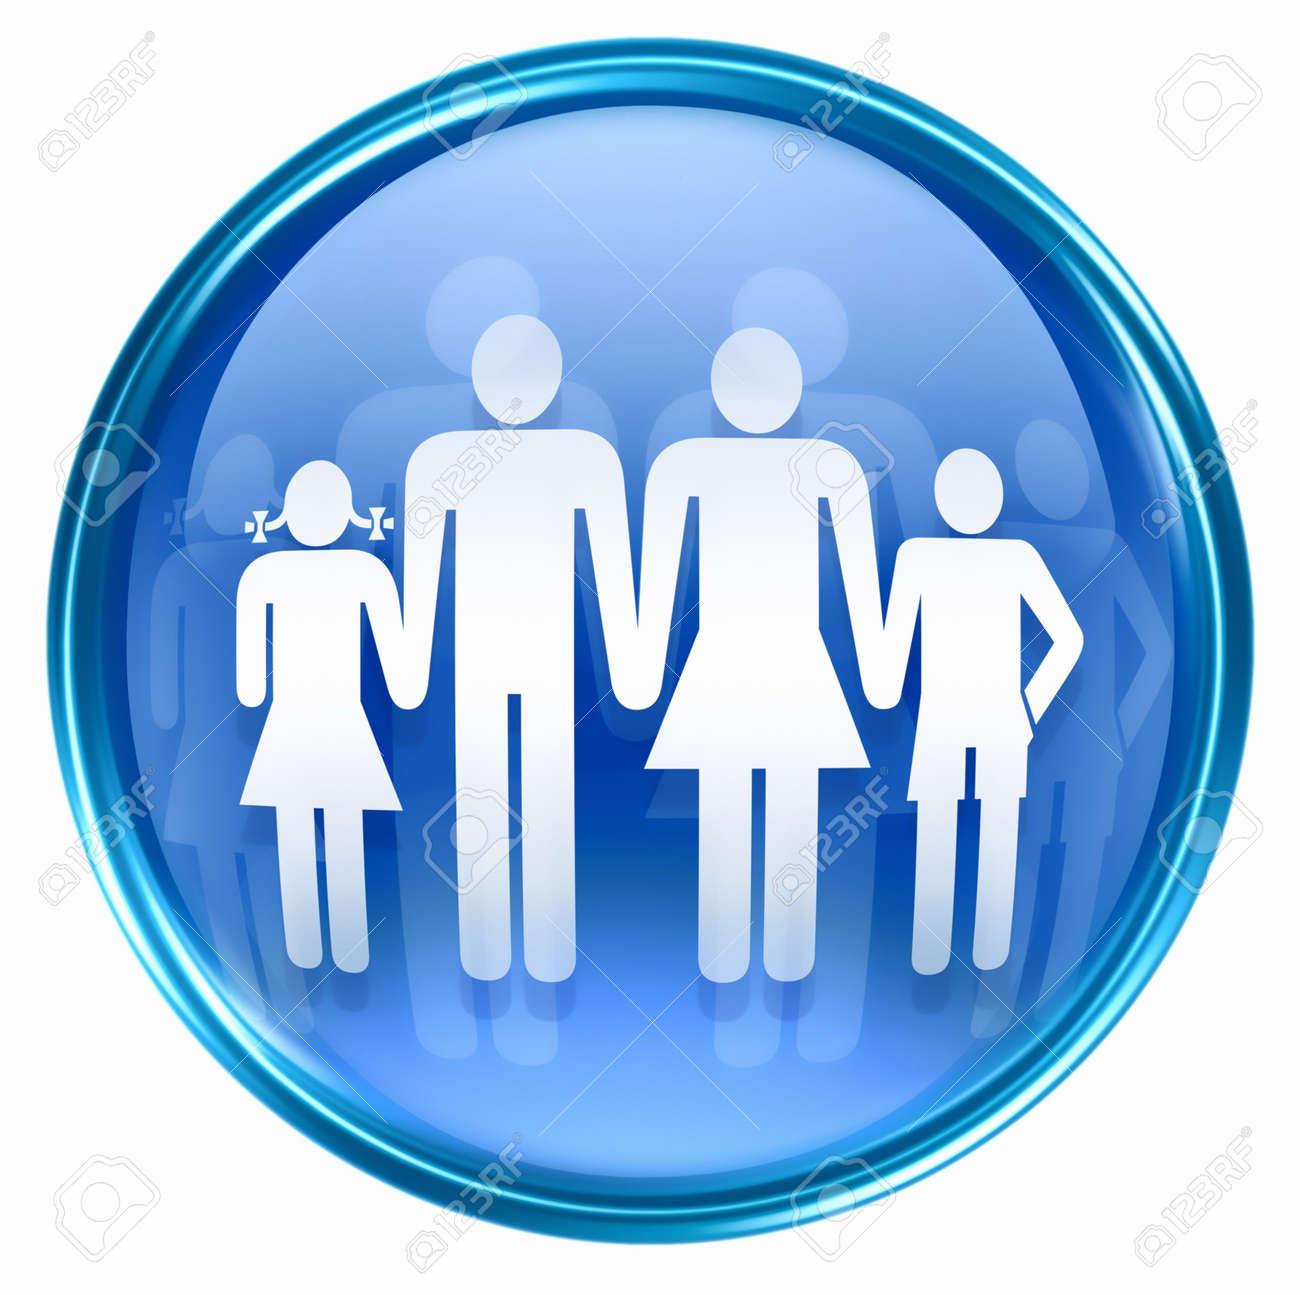 people icon blue, isolated on white background. Stock Photo - 2854941